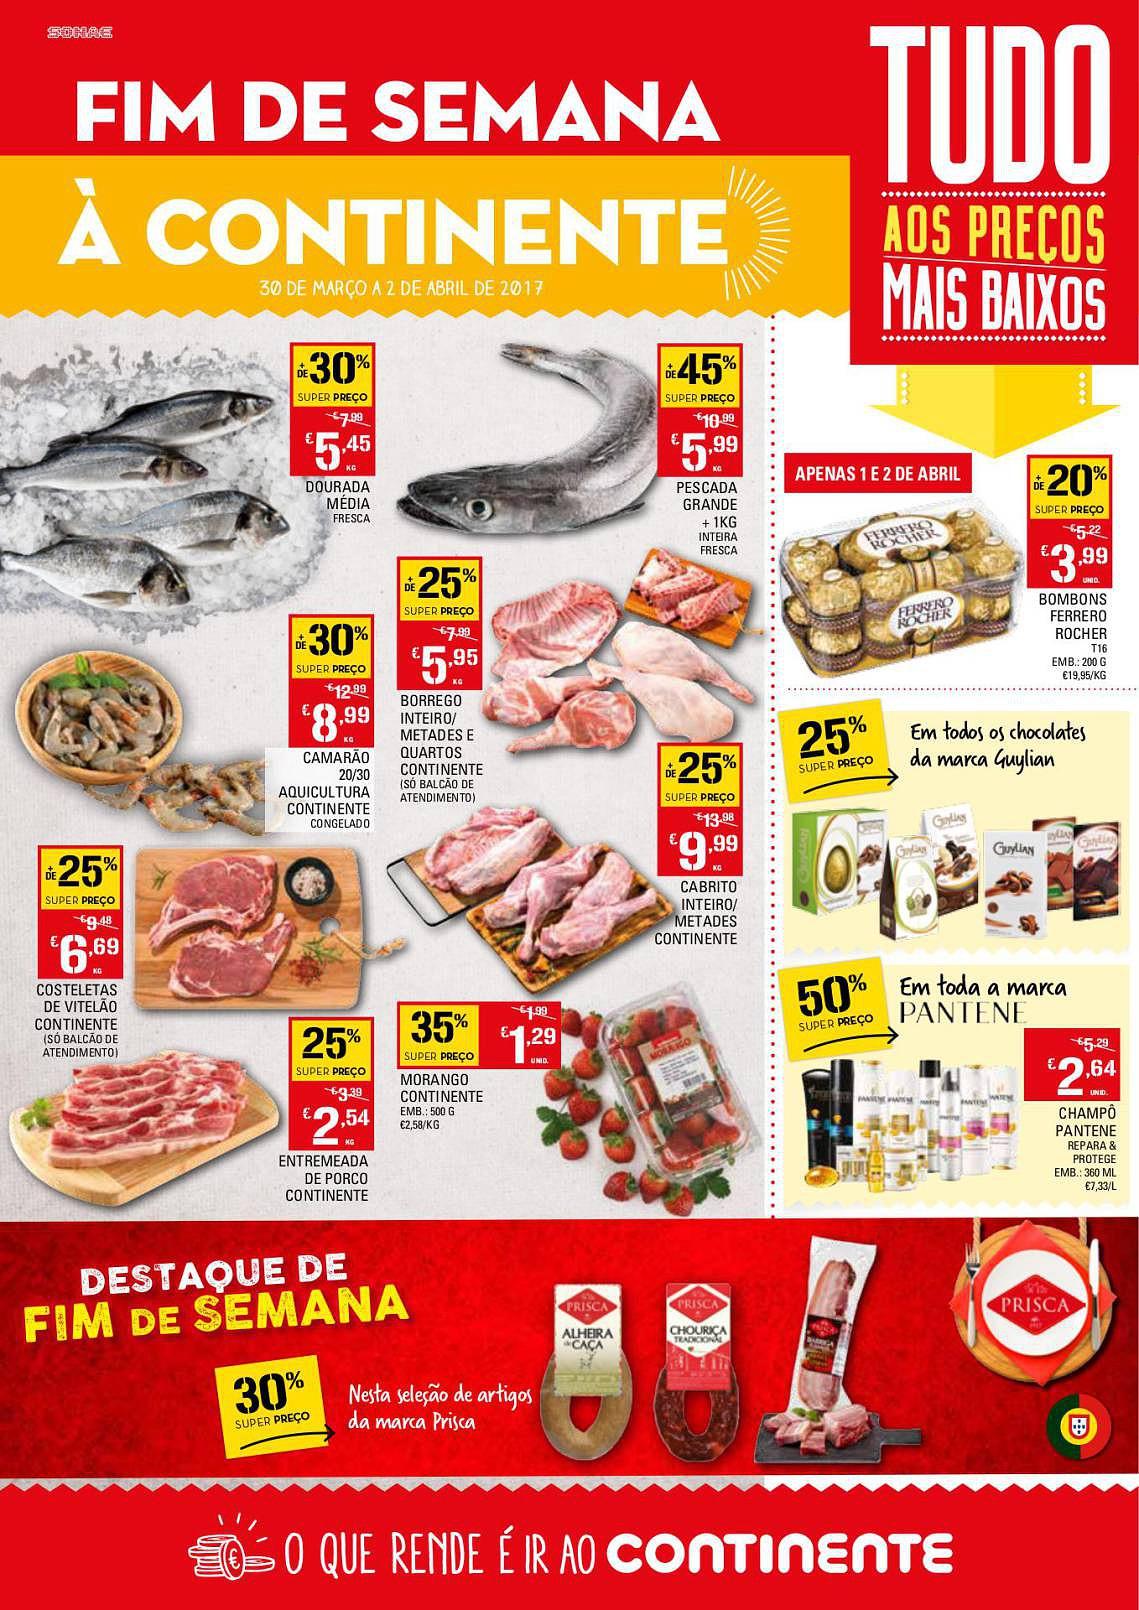 promocoes-continente-folheto-fim-semana-1.jpg